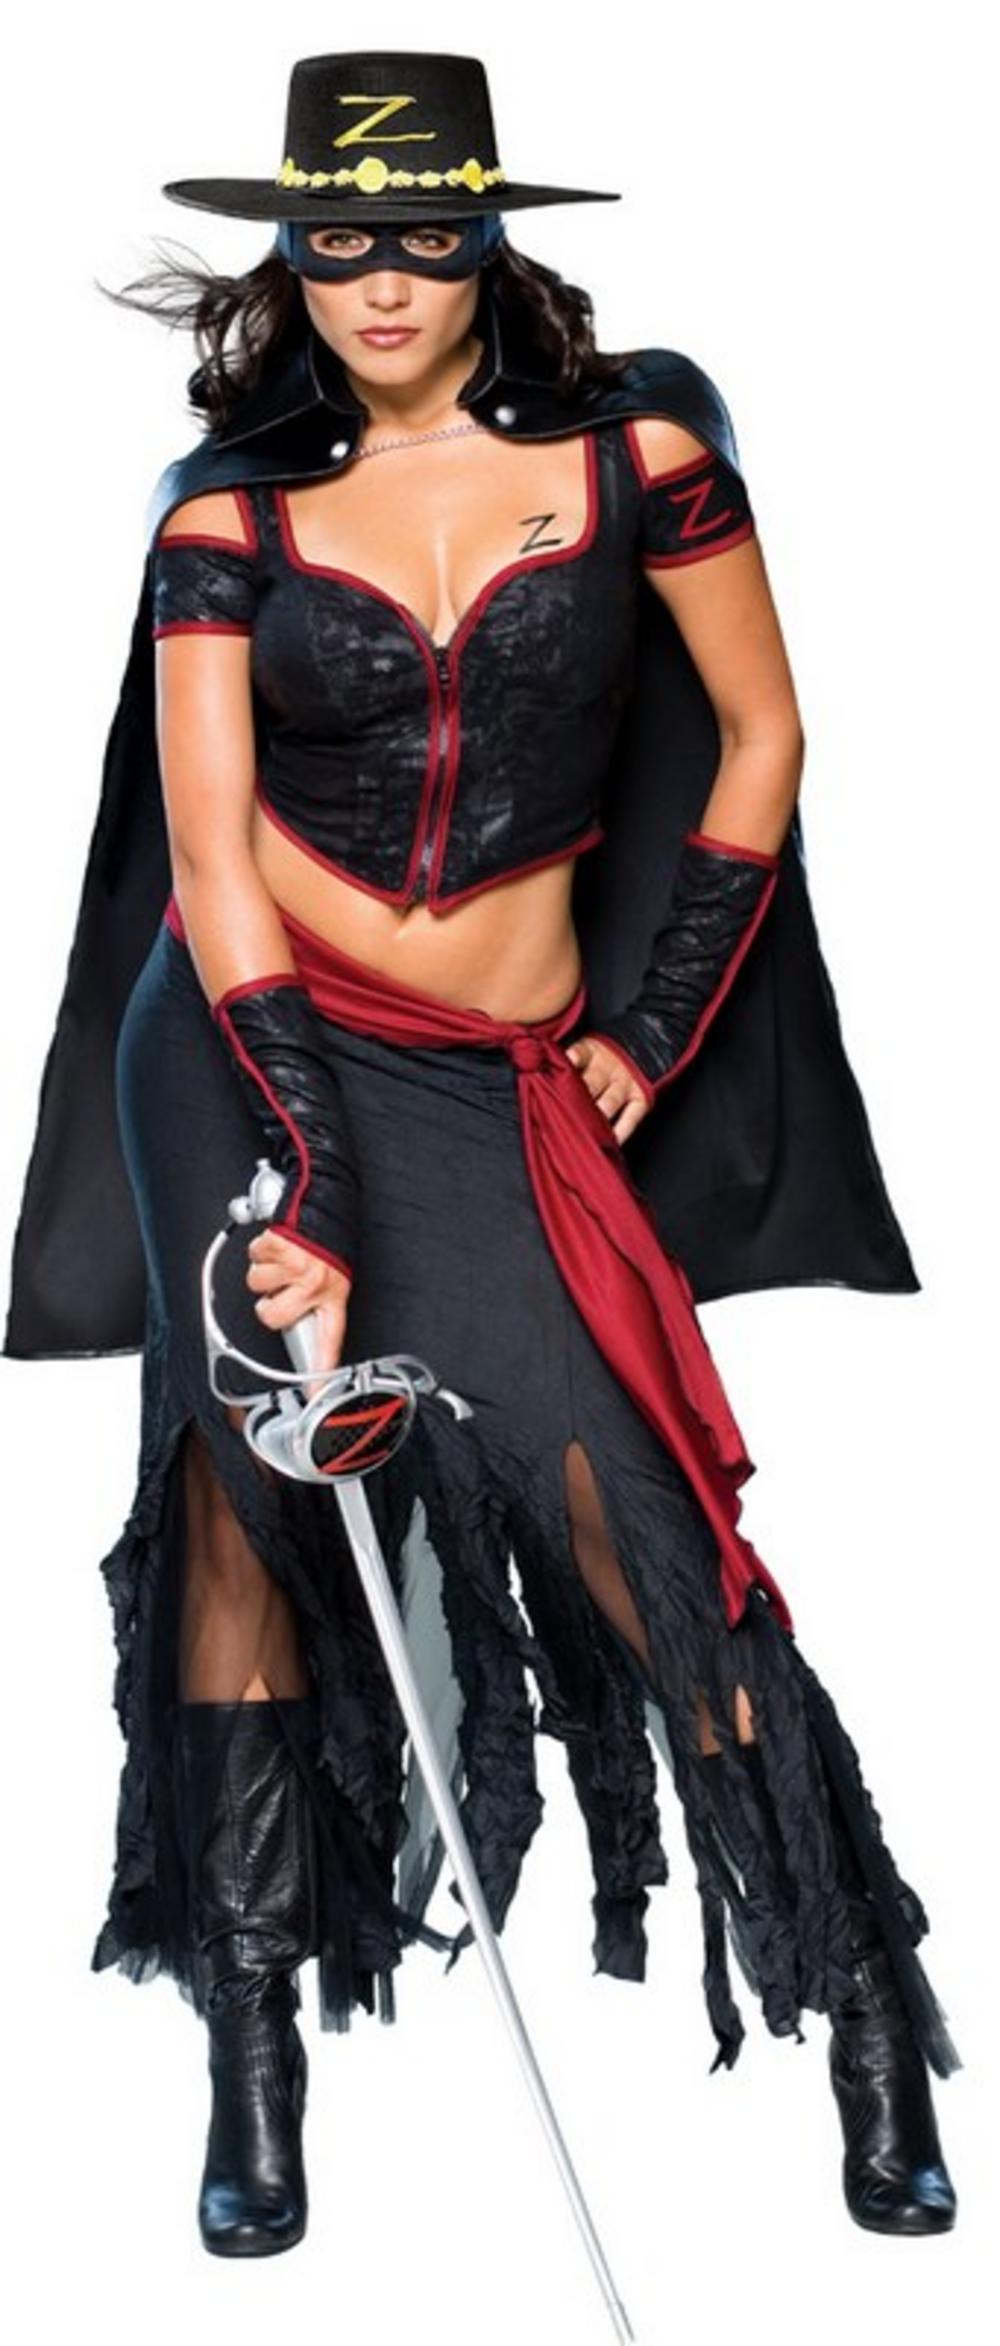 El Zorro Halloween Costumes